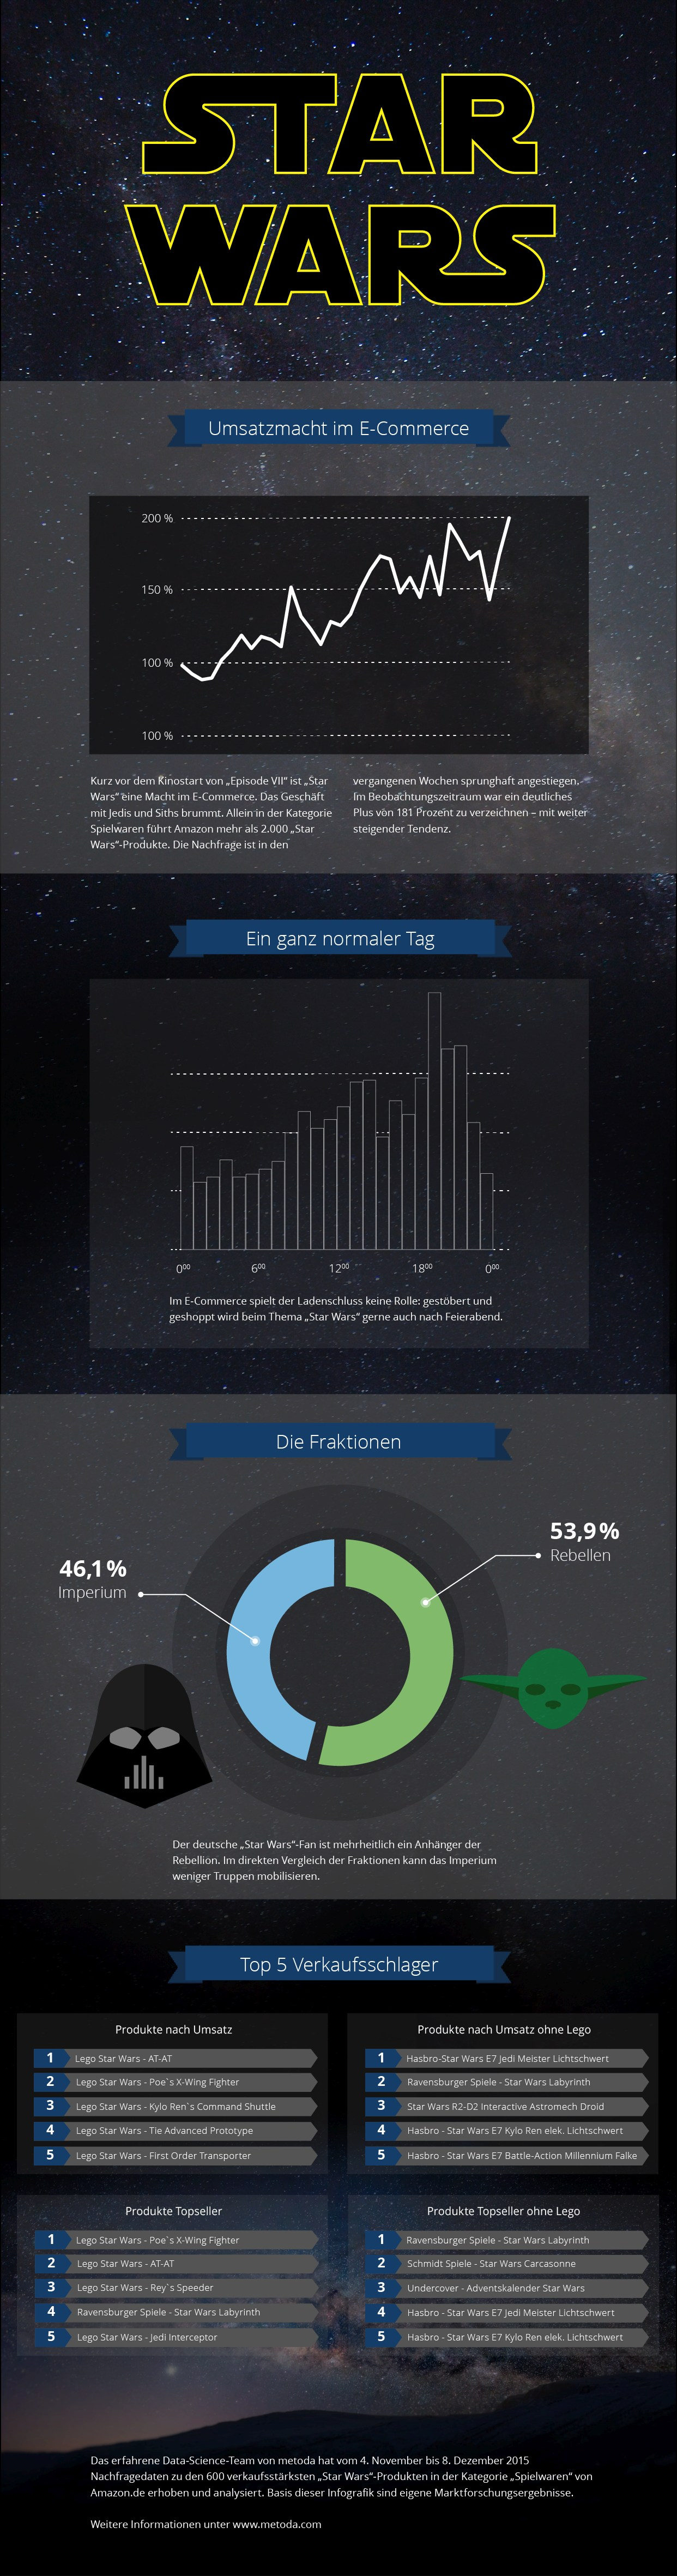 infografik metoda star wars